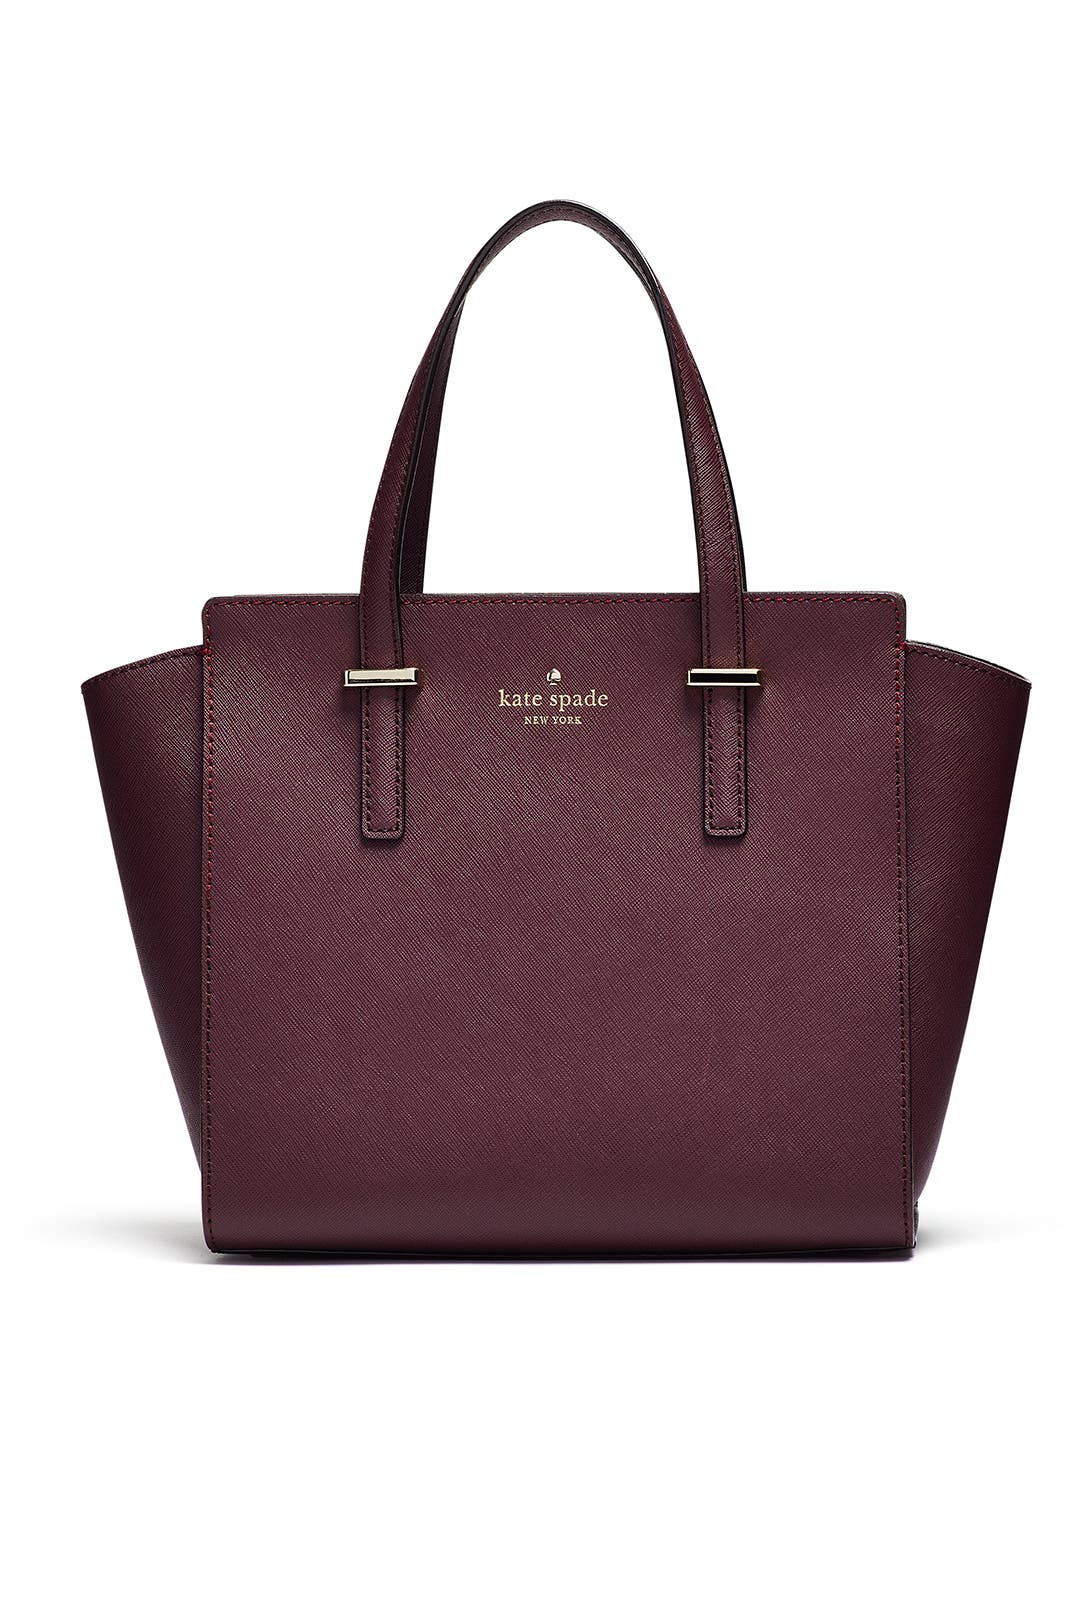 Mulled Wine Hayden Bag by kate spade new york accessories ...